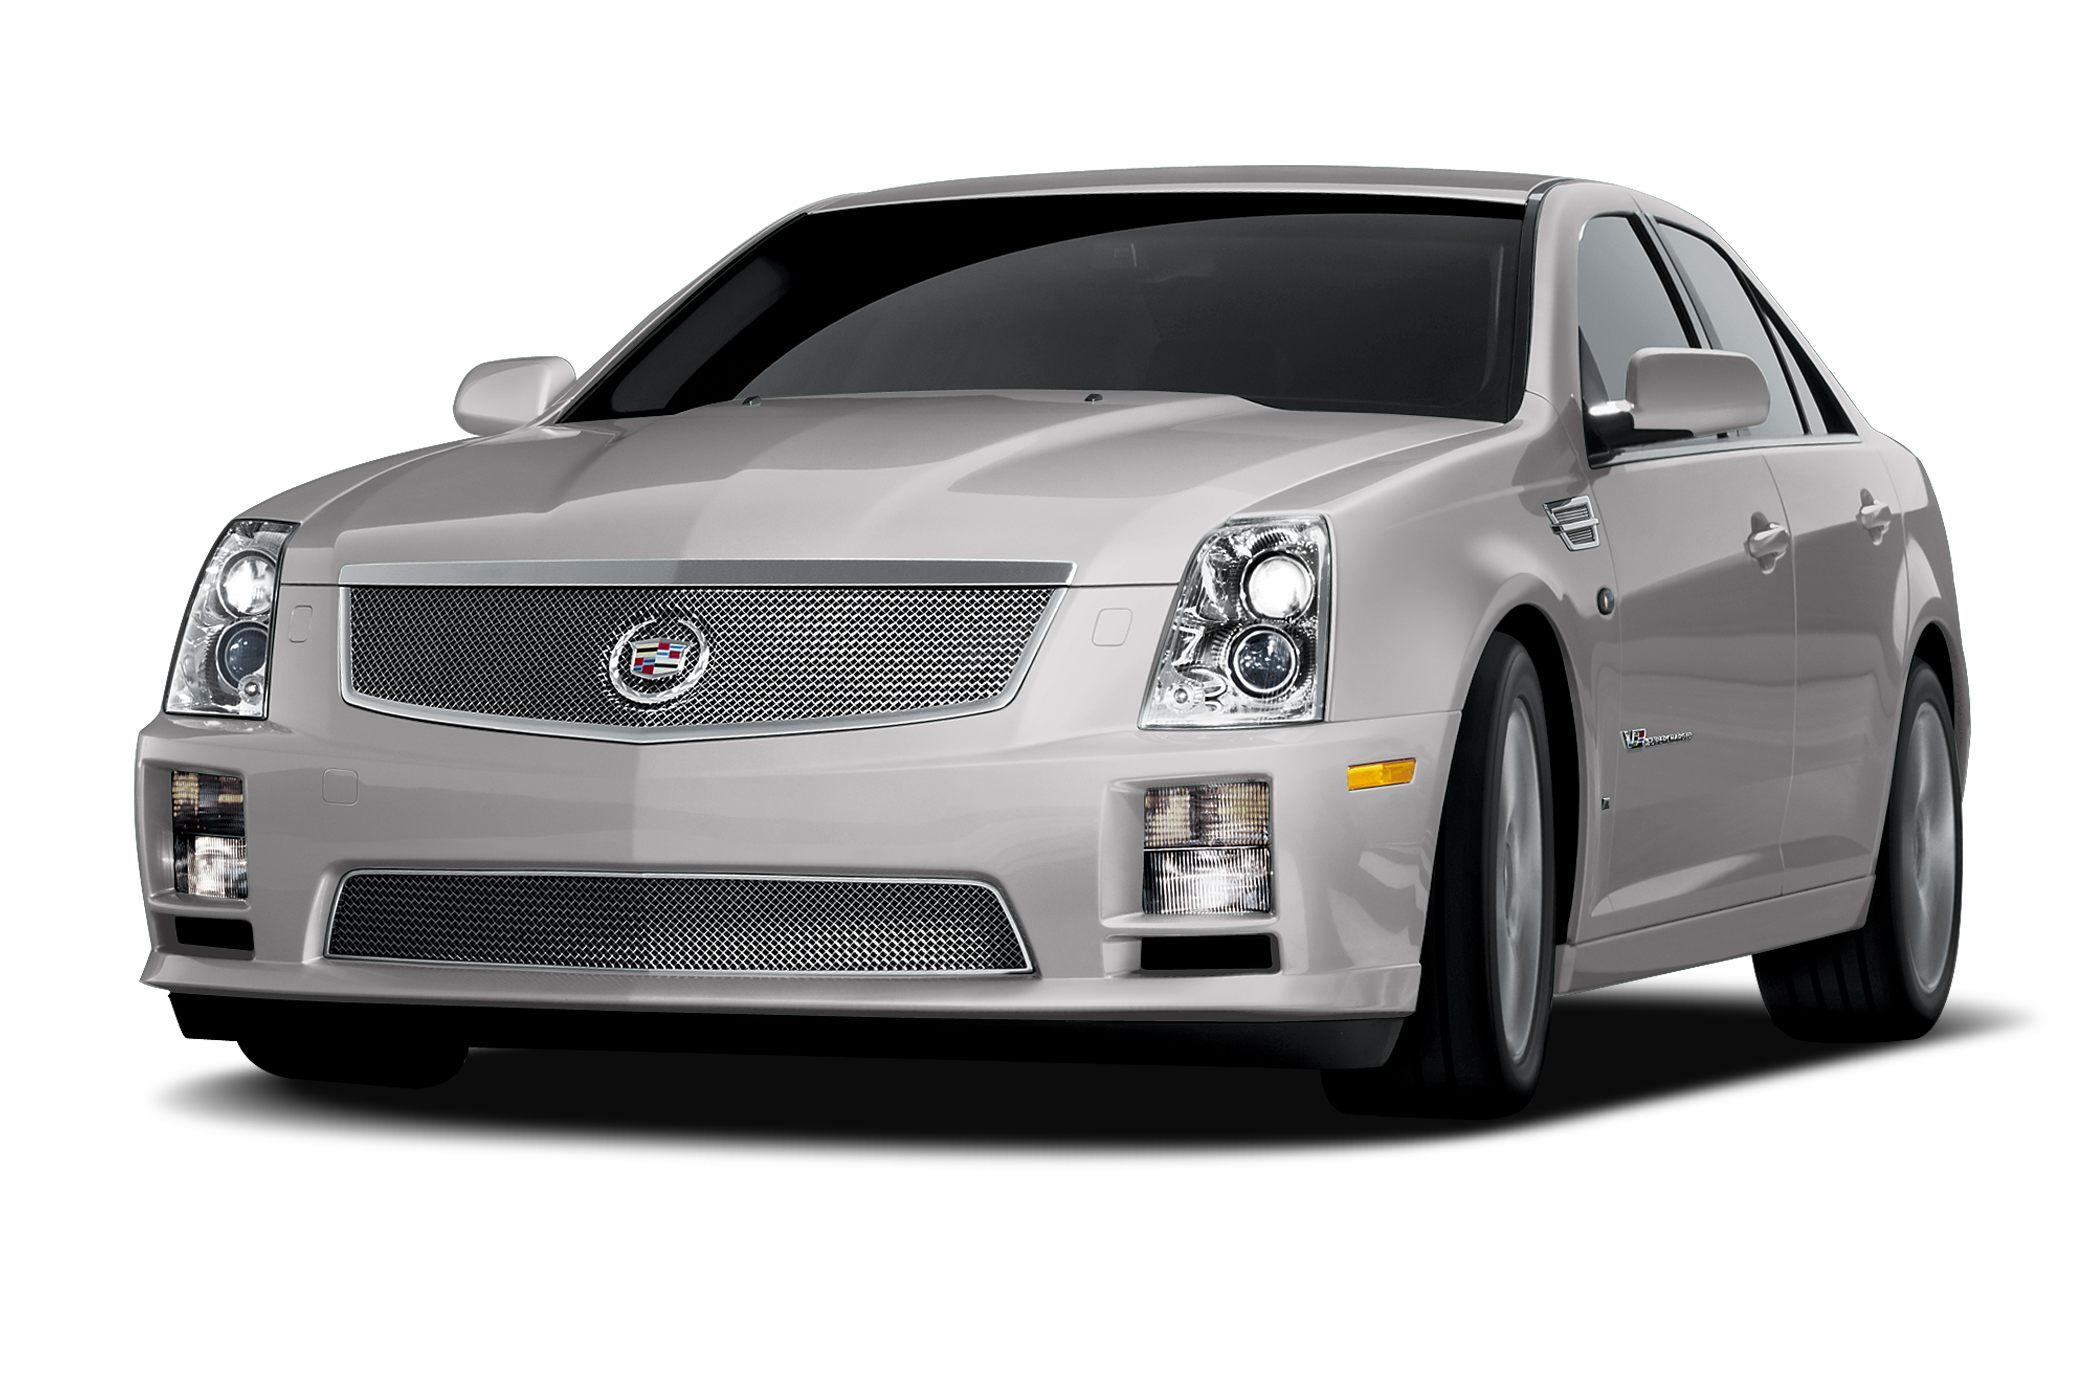 2008 Cadillac STS-V